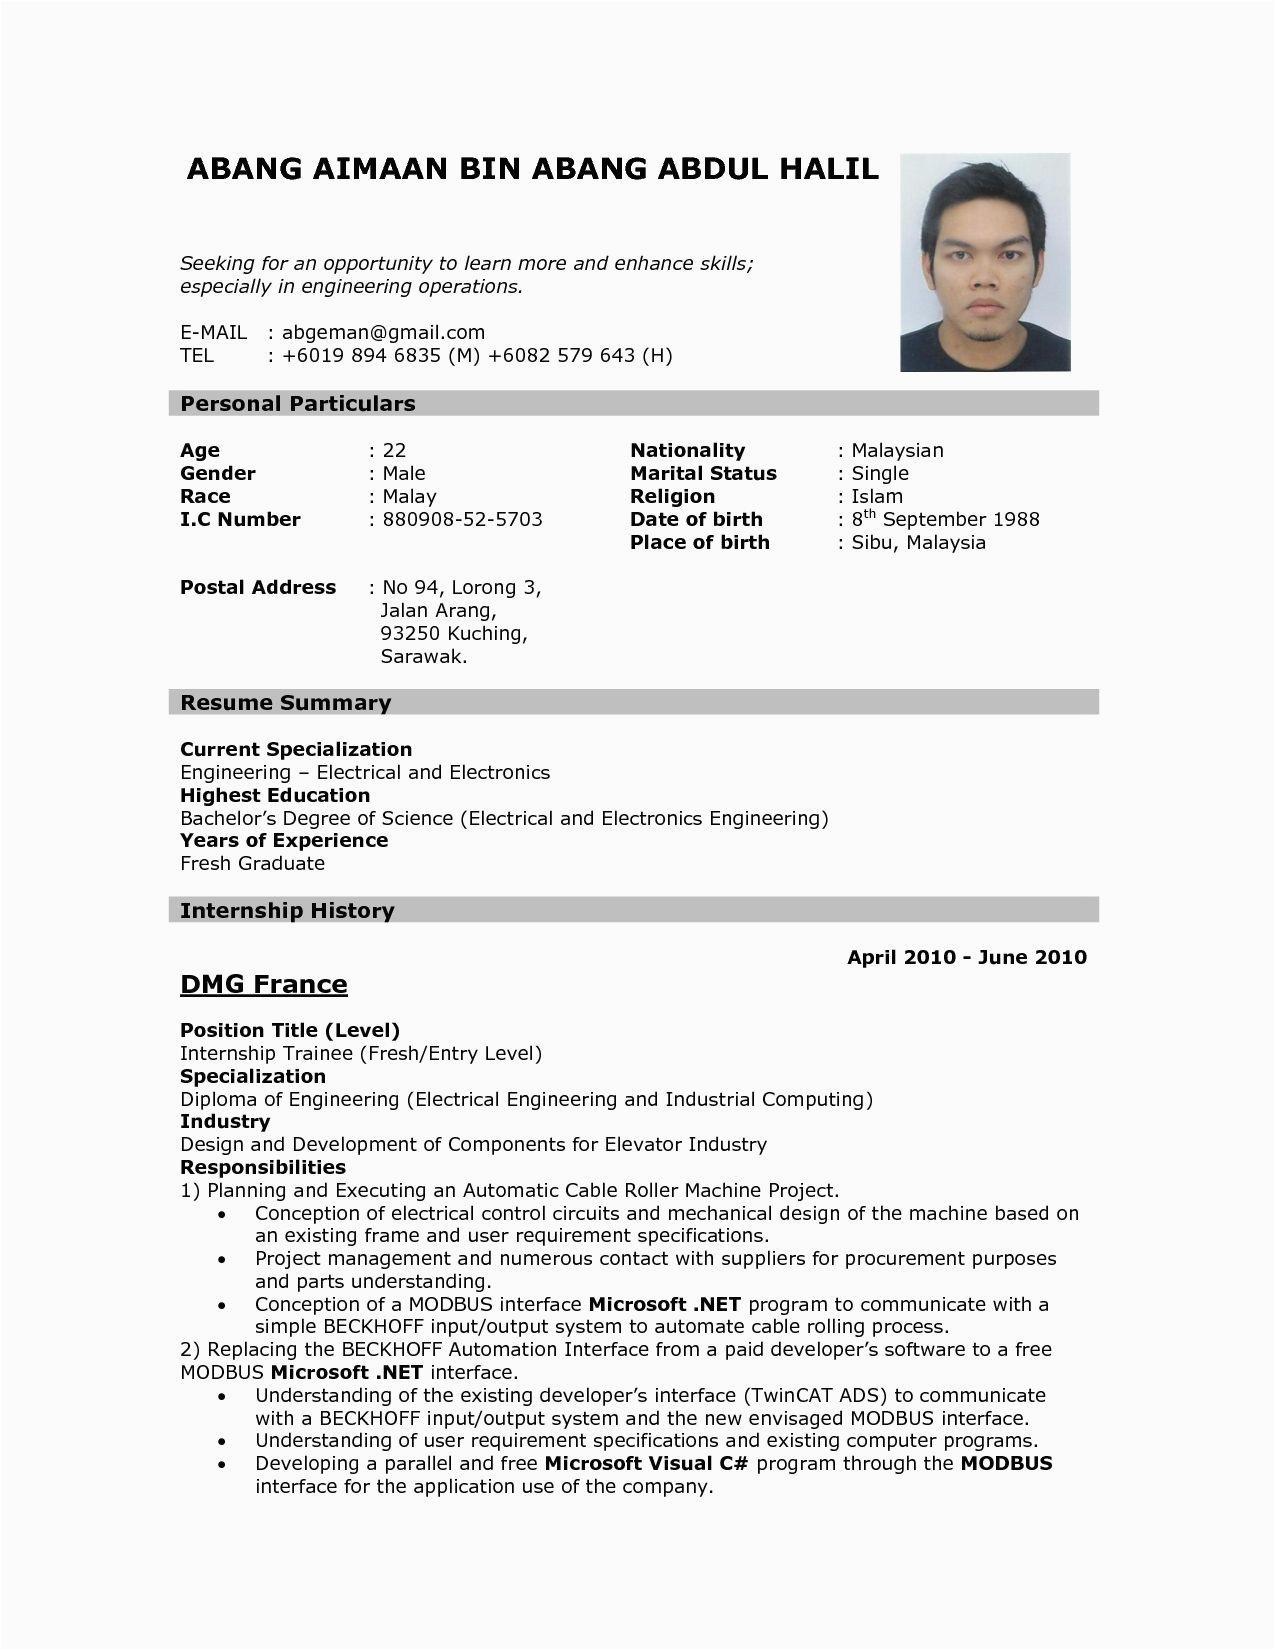 Sample Of Good Resume for Job Application Example Good Resume for Job Application Best Resume